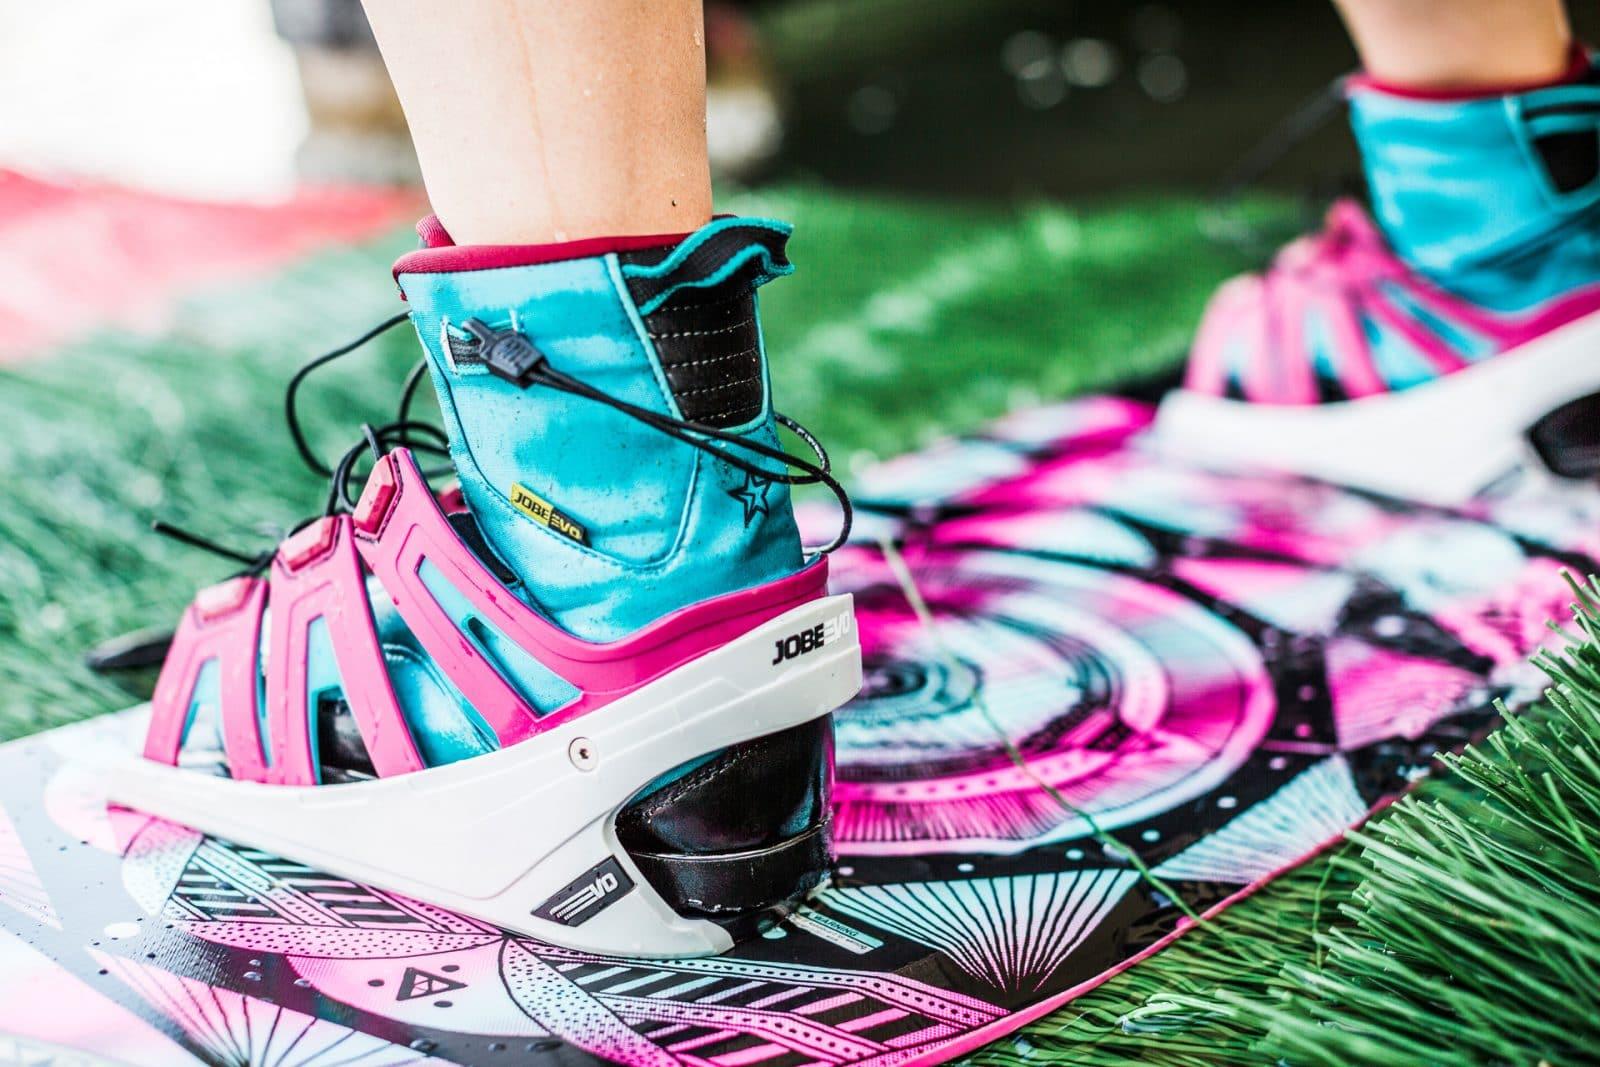 evo-sneaker-women-teal-blue-pair-1443452030